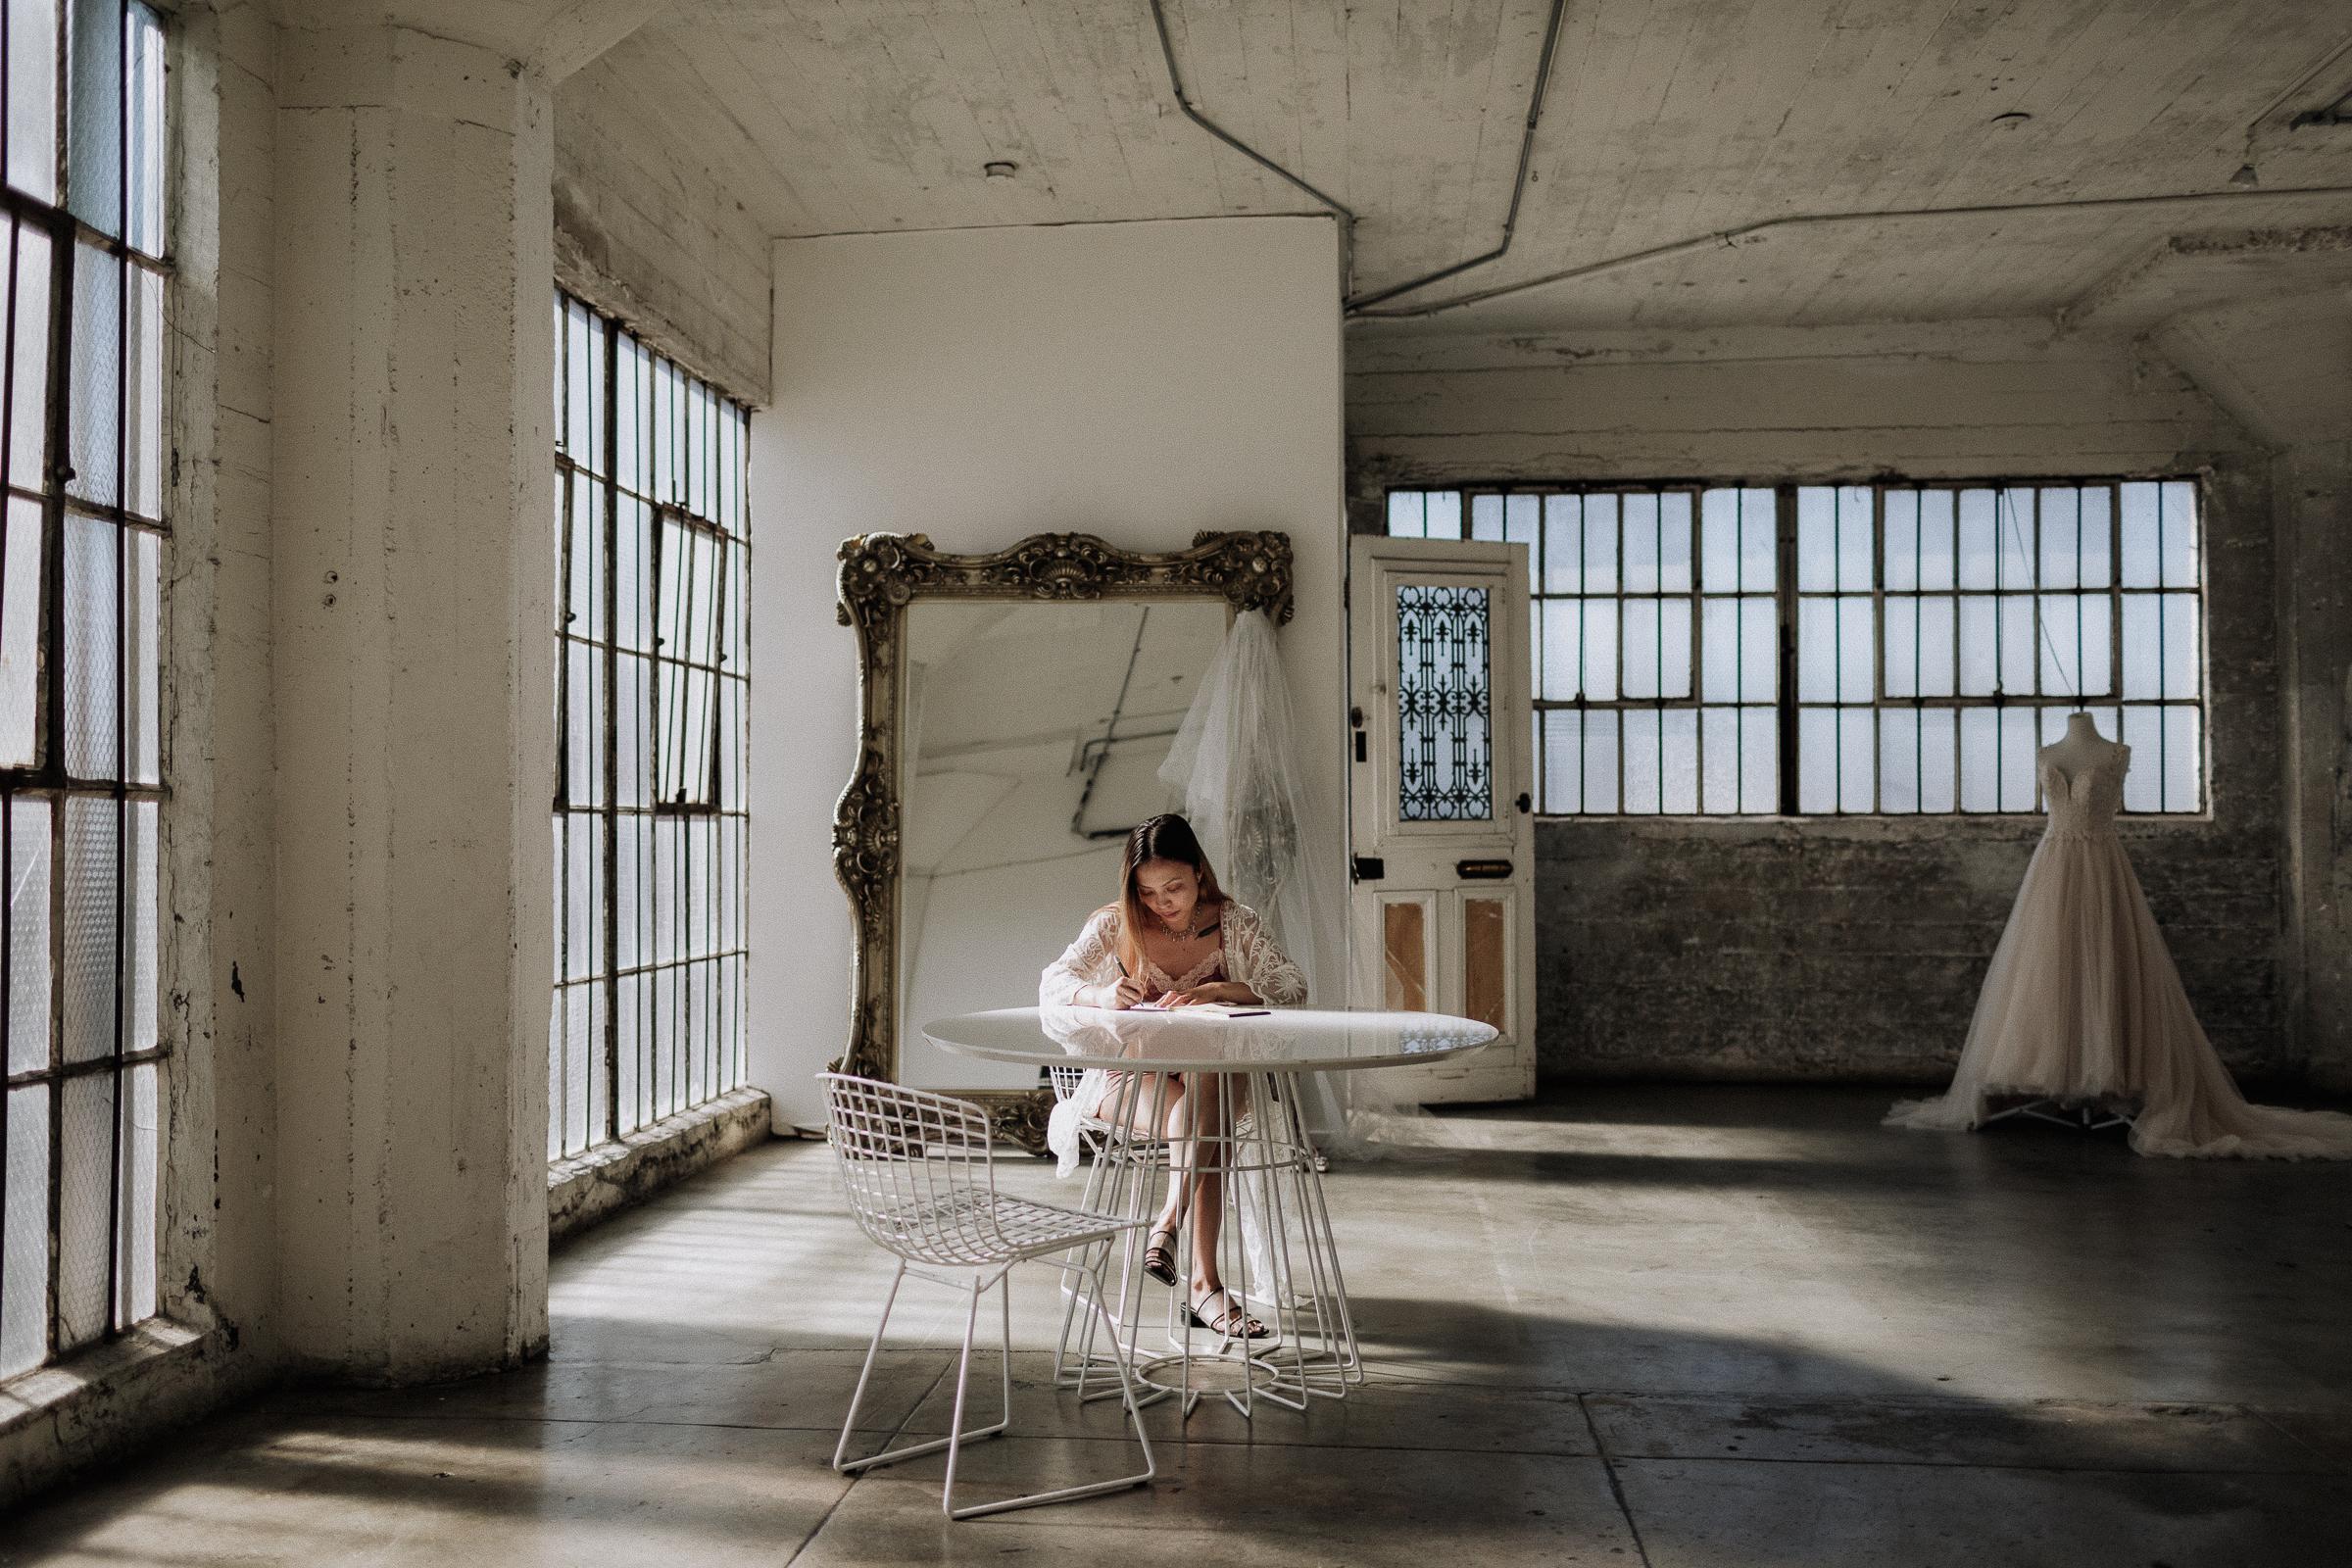 Gretchen Gause Photography | Los Angeles Hudson Loft Wedding #hudsonloft #laweddingphotographer #DTLA #weddingplanning #romanticwedding #rooftopwedding #weddingphotography #weddingdress #vows